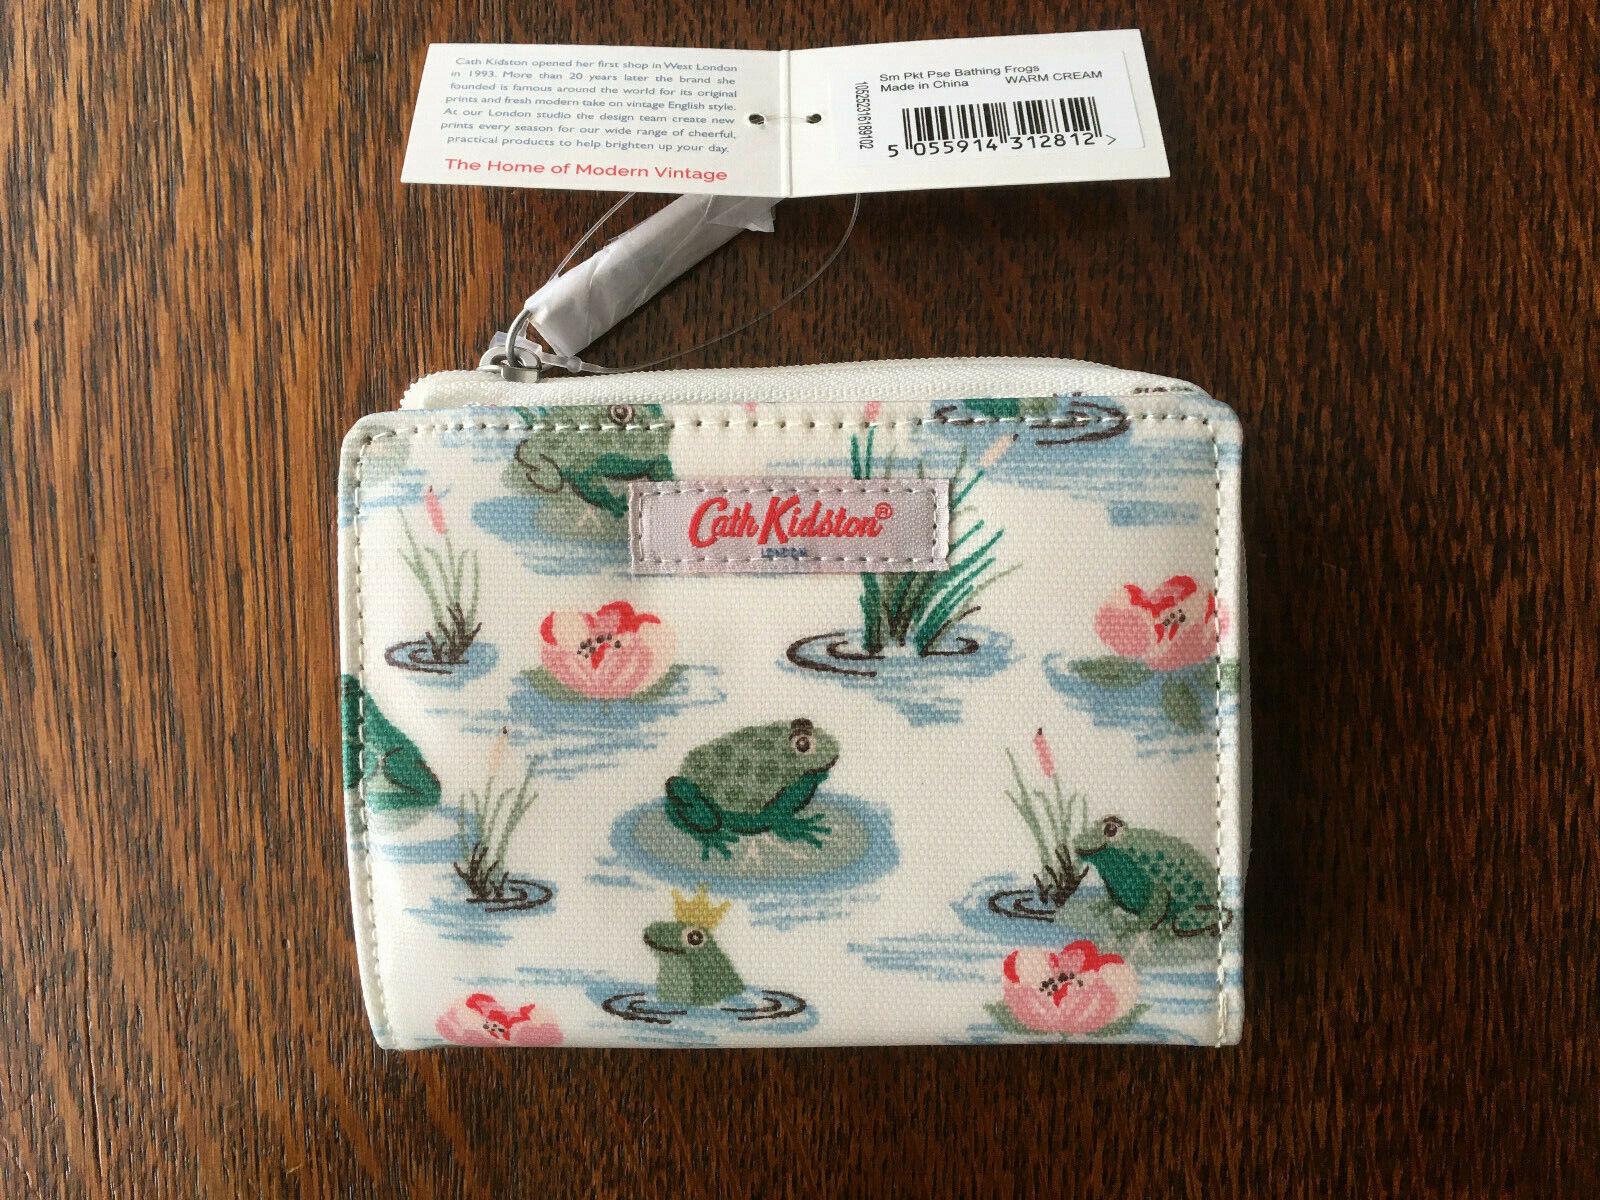 Cath Kidston Bathing Frogs Slim Pocket Purse / Travel Wallet - BNWT